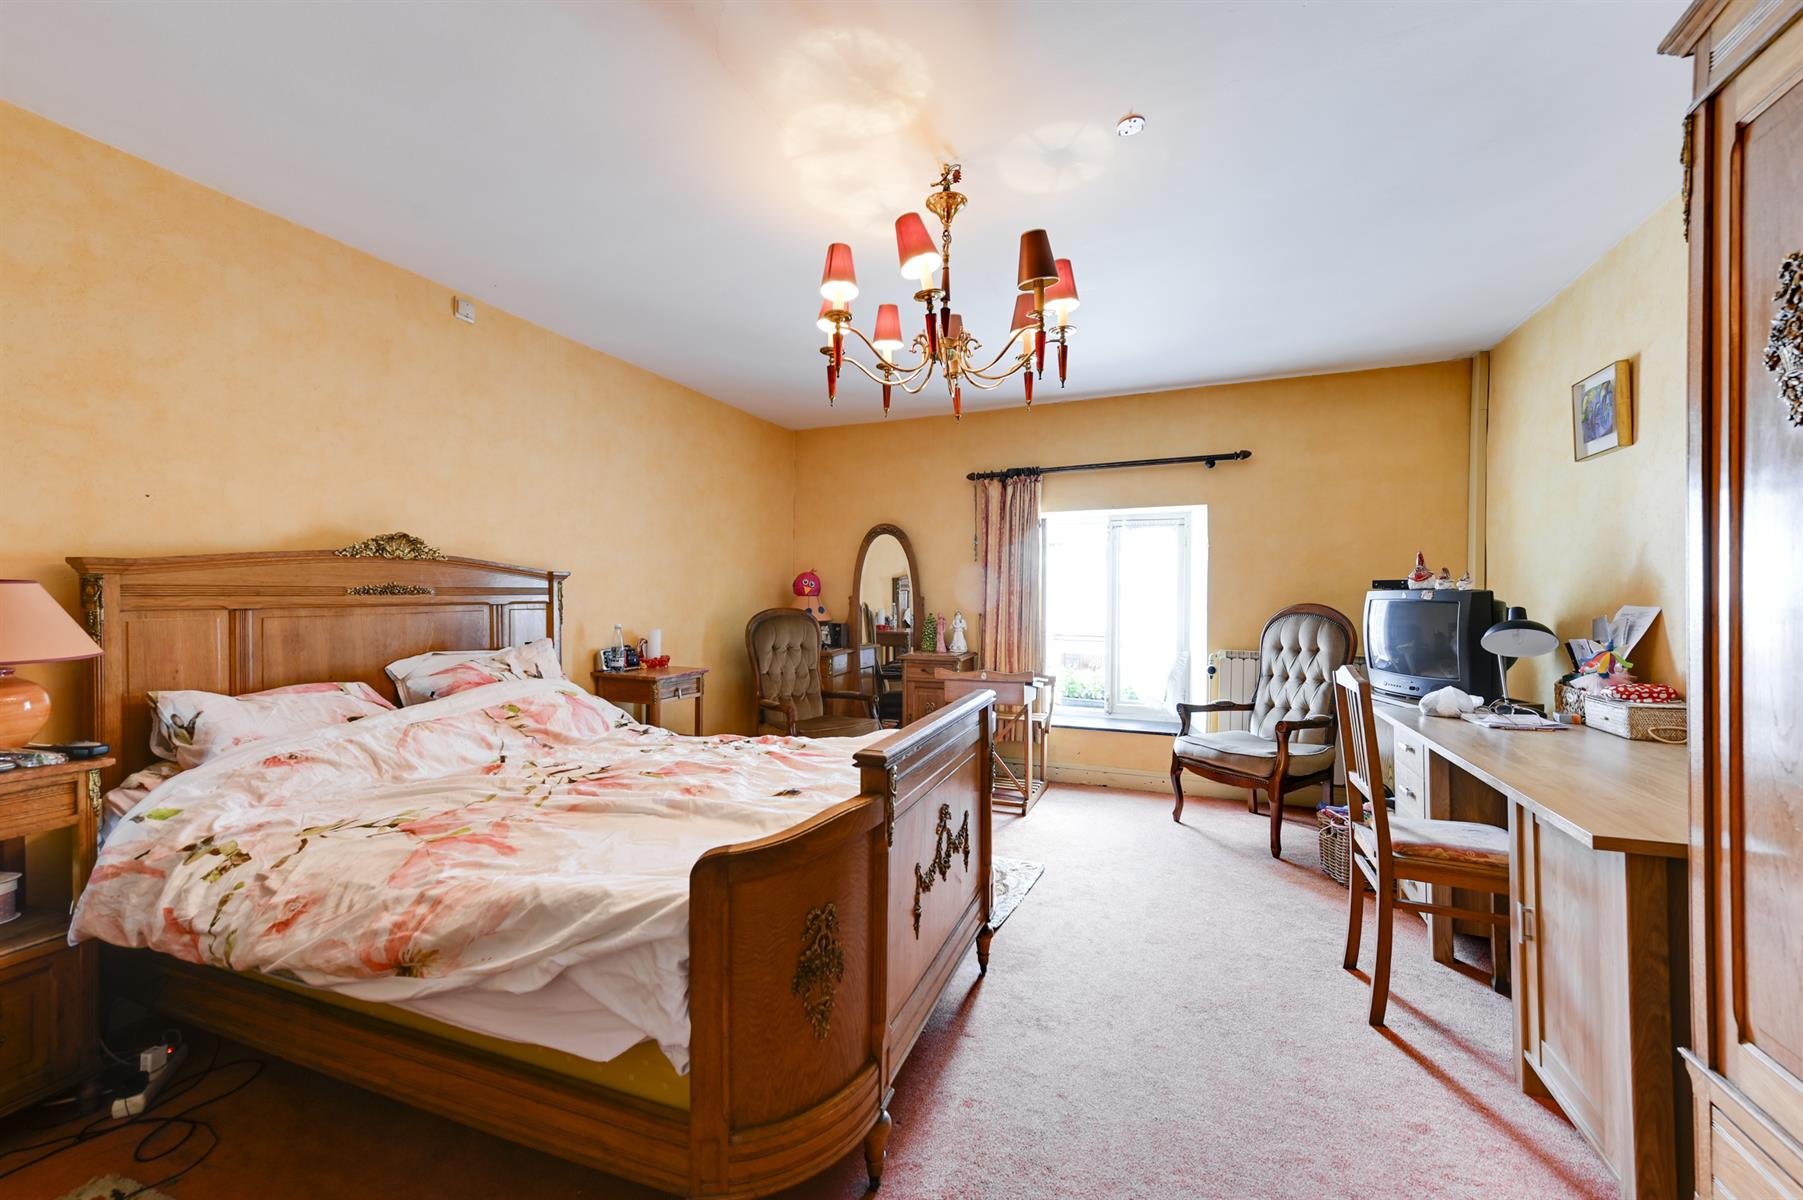 Maison - Rochefort - #4072672-17